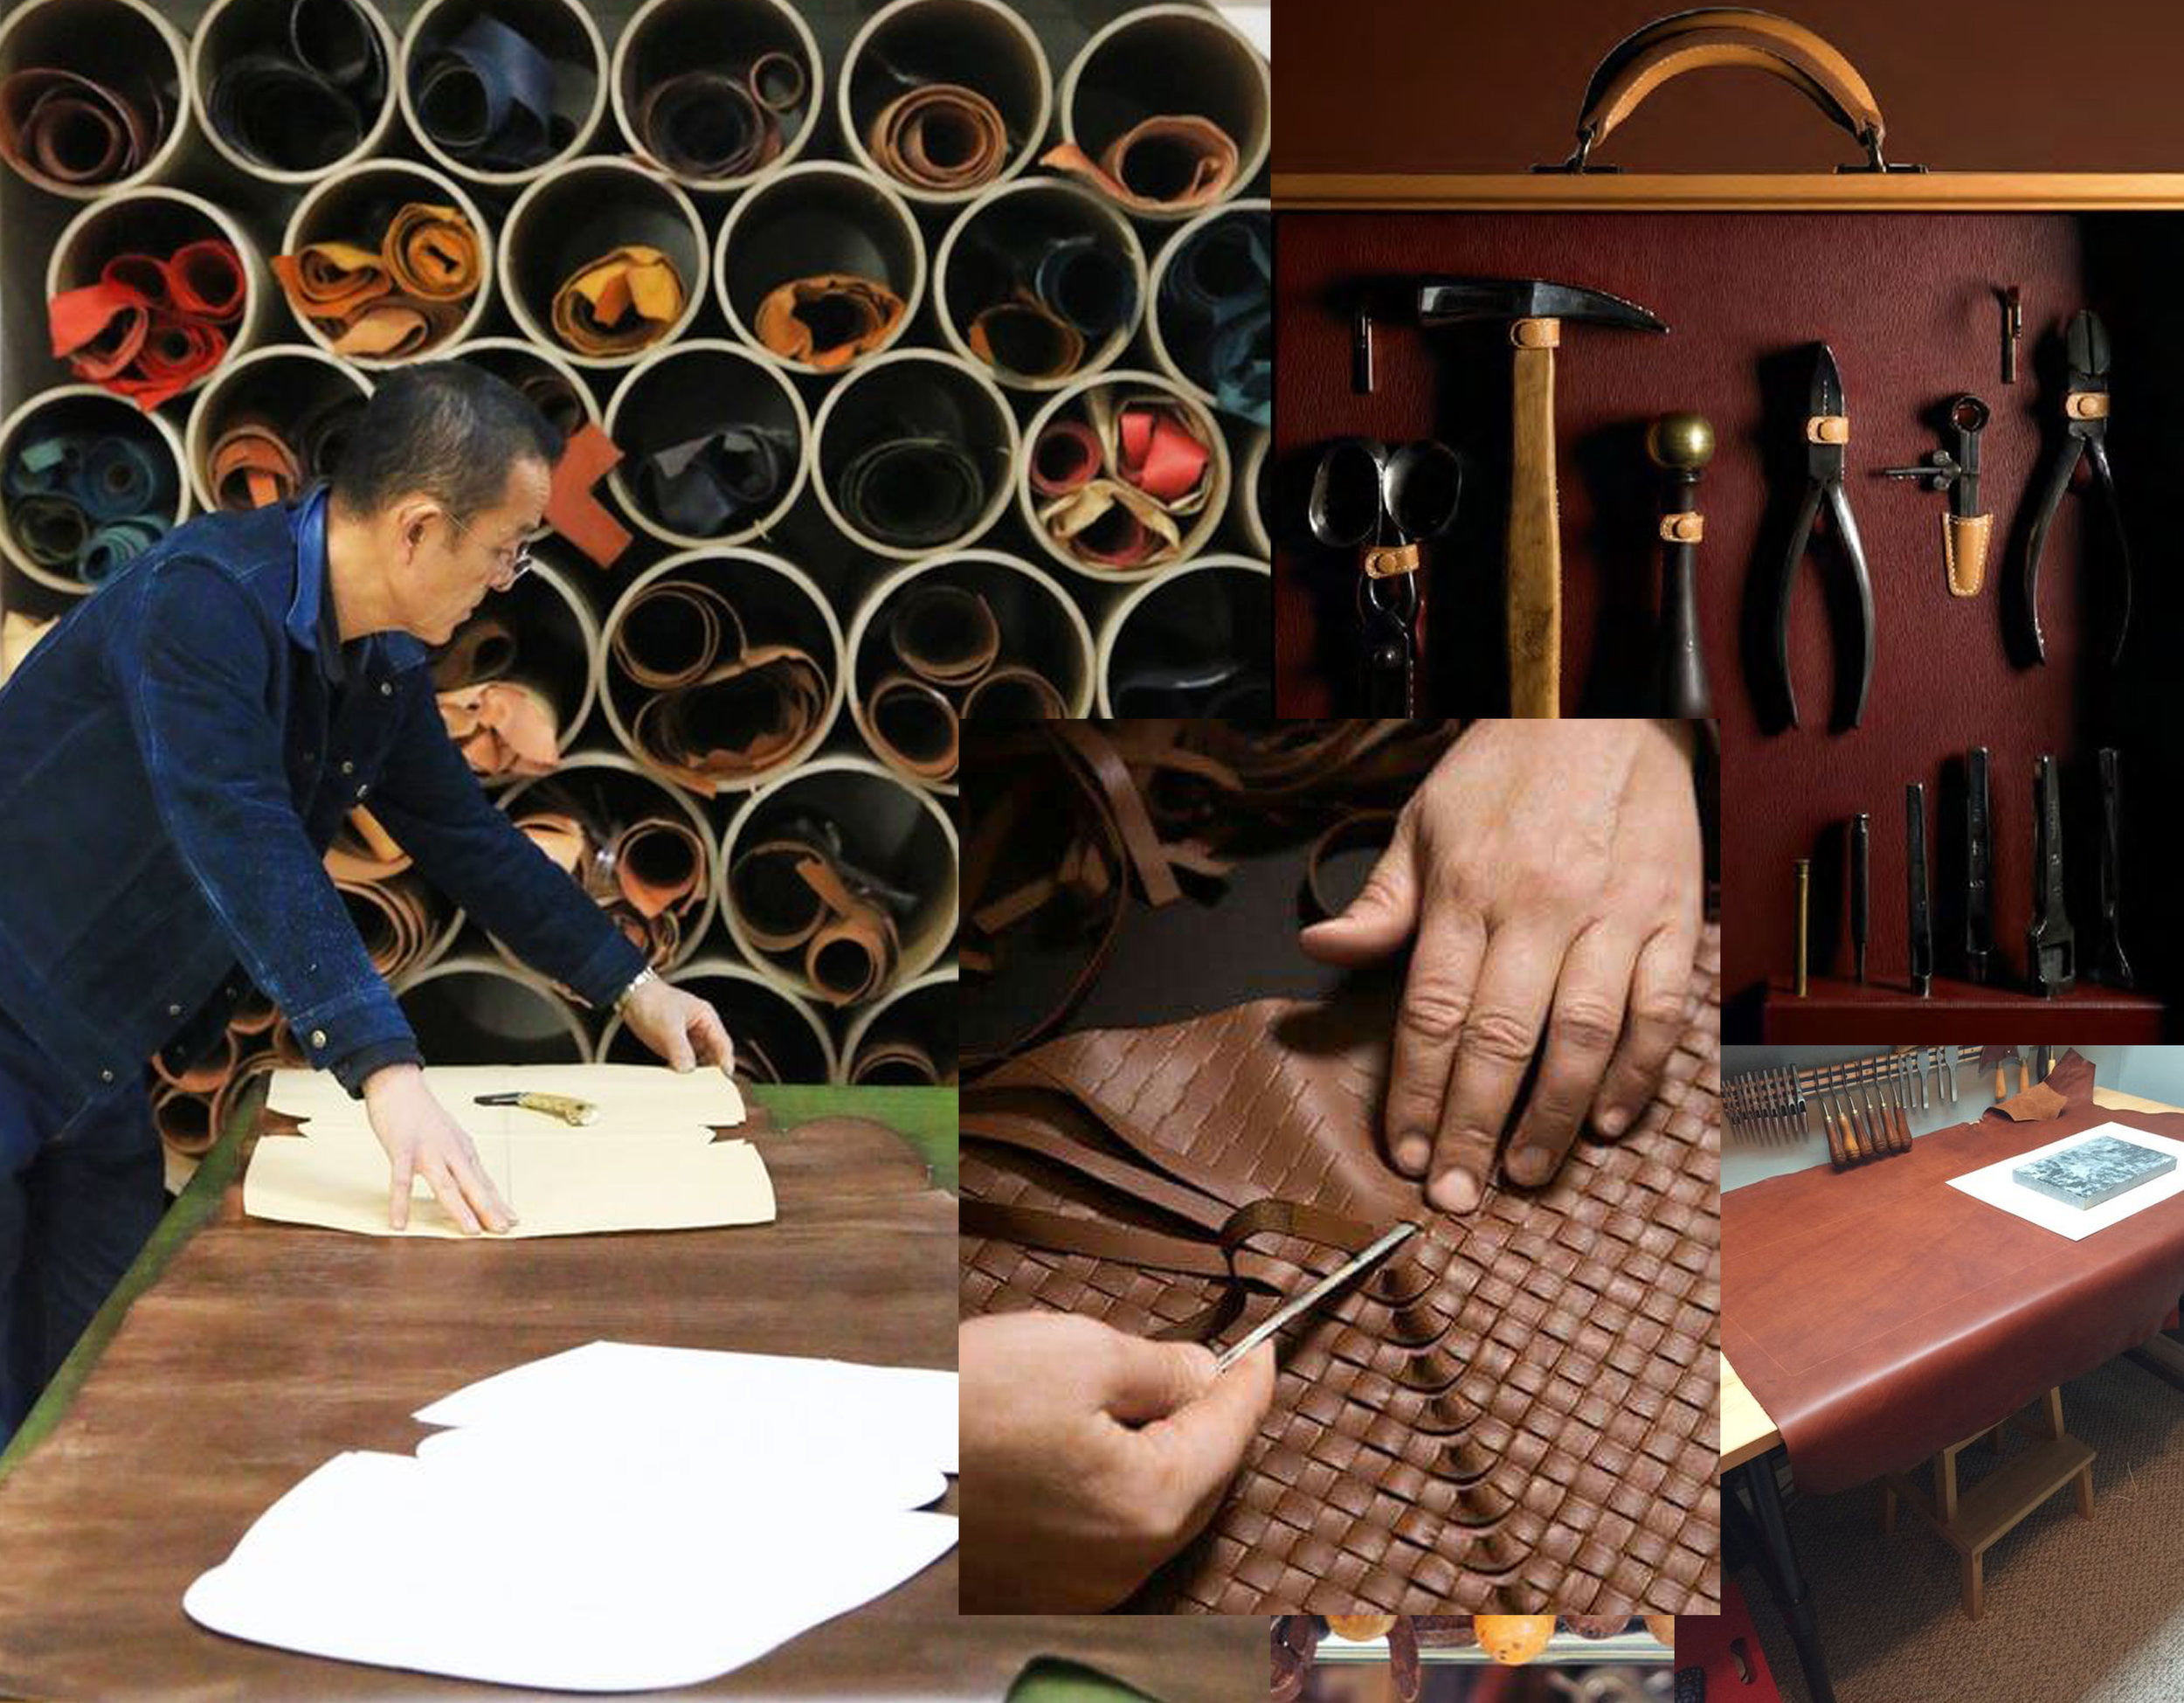 cutting the leather via  Moto  - tools Hermes via  Scribd  - woven leather via  Sohu